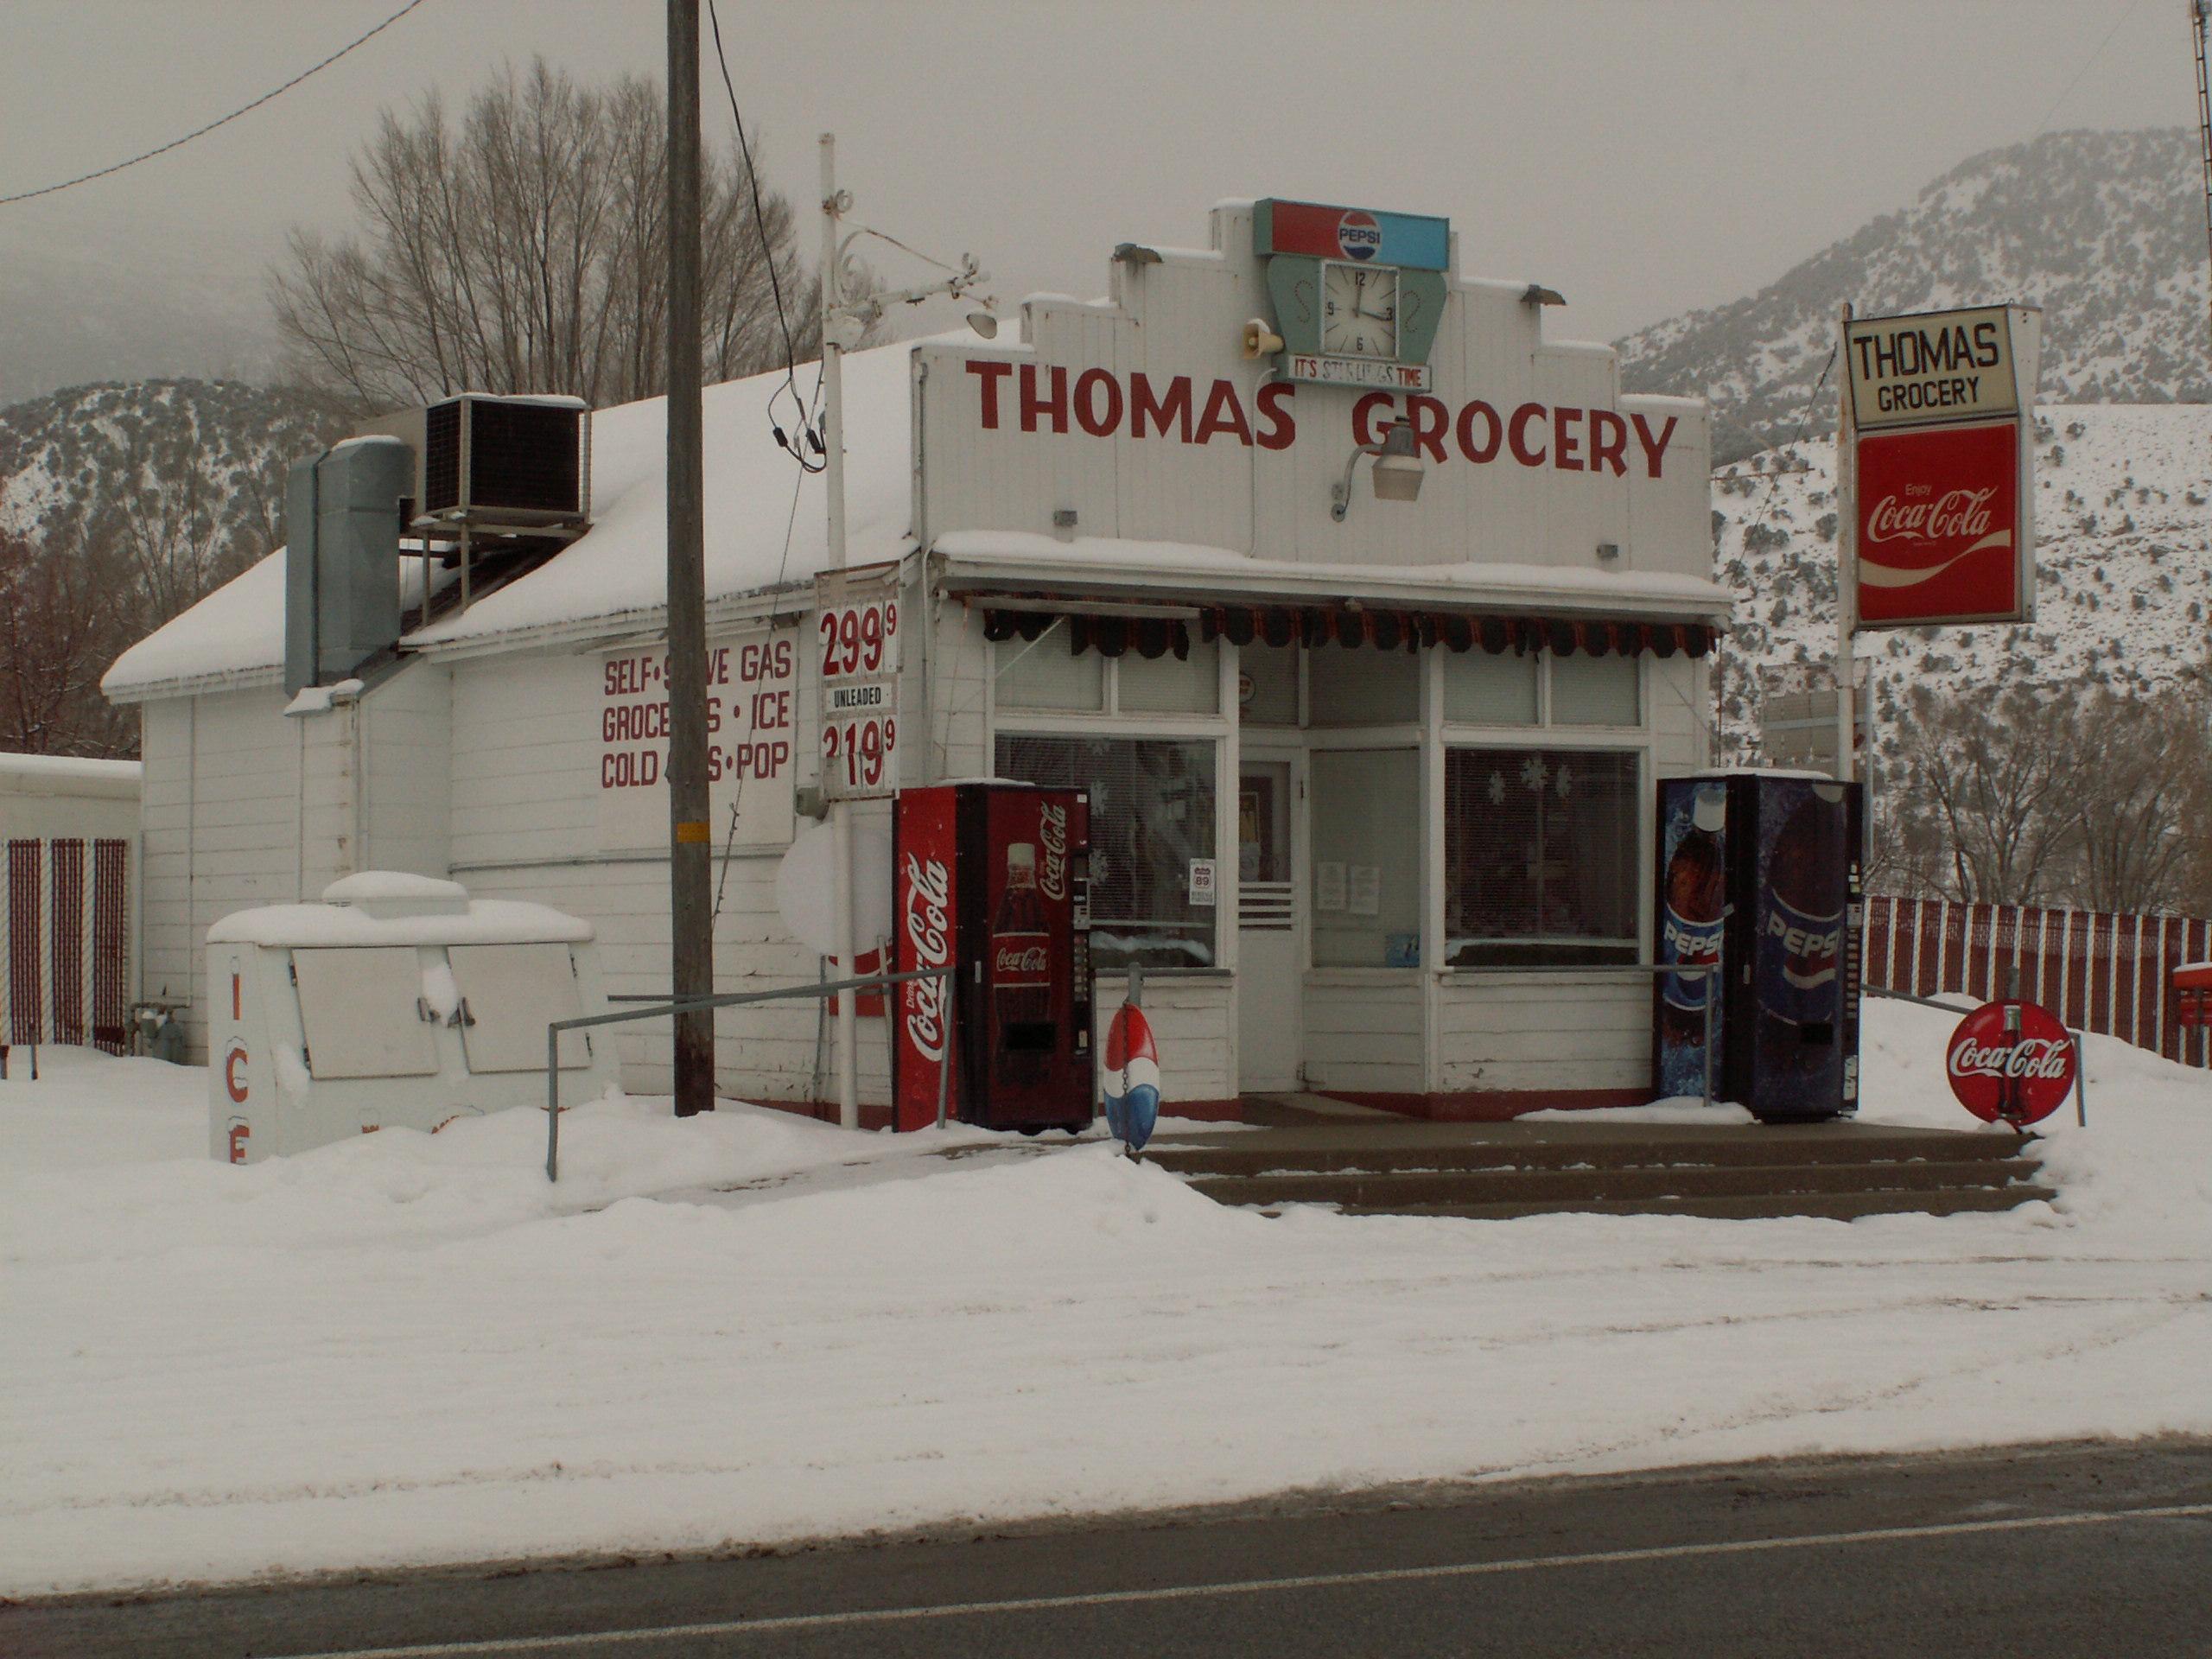 Thomas Grocery - 95 South Main Street, Sterling, Utah U.S.A. - February 1, 2008